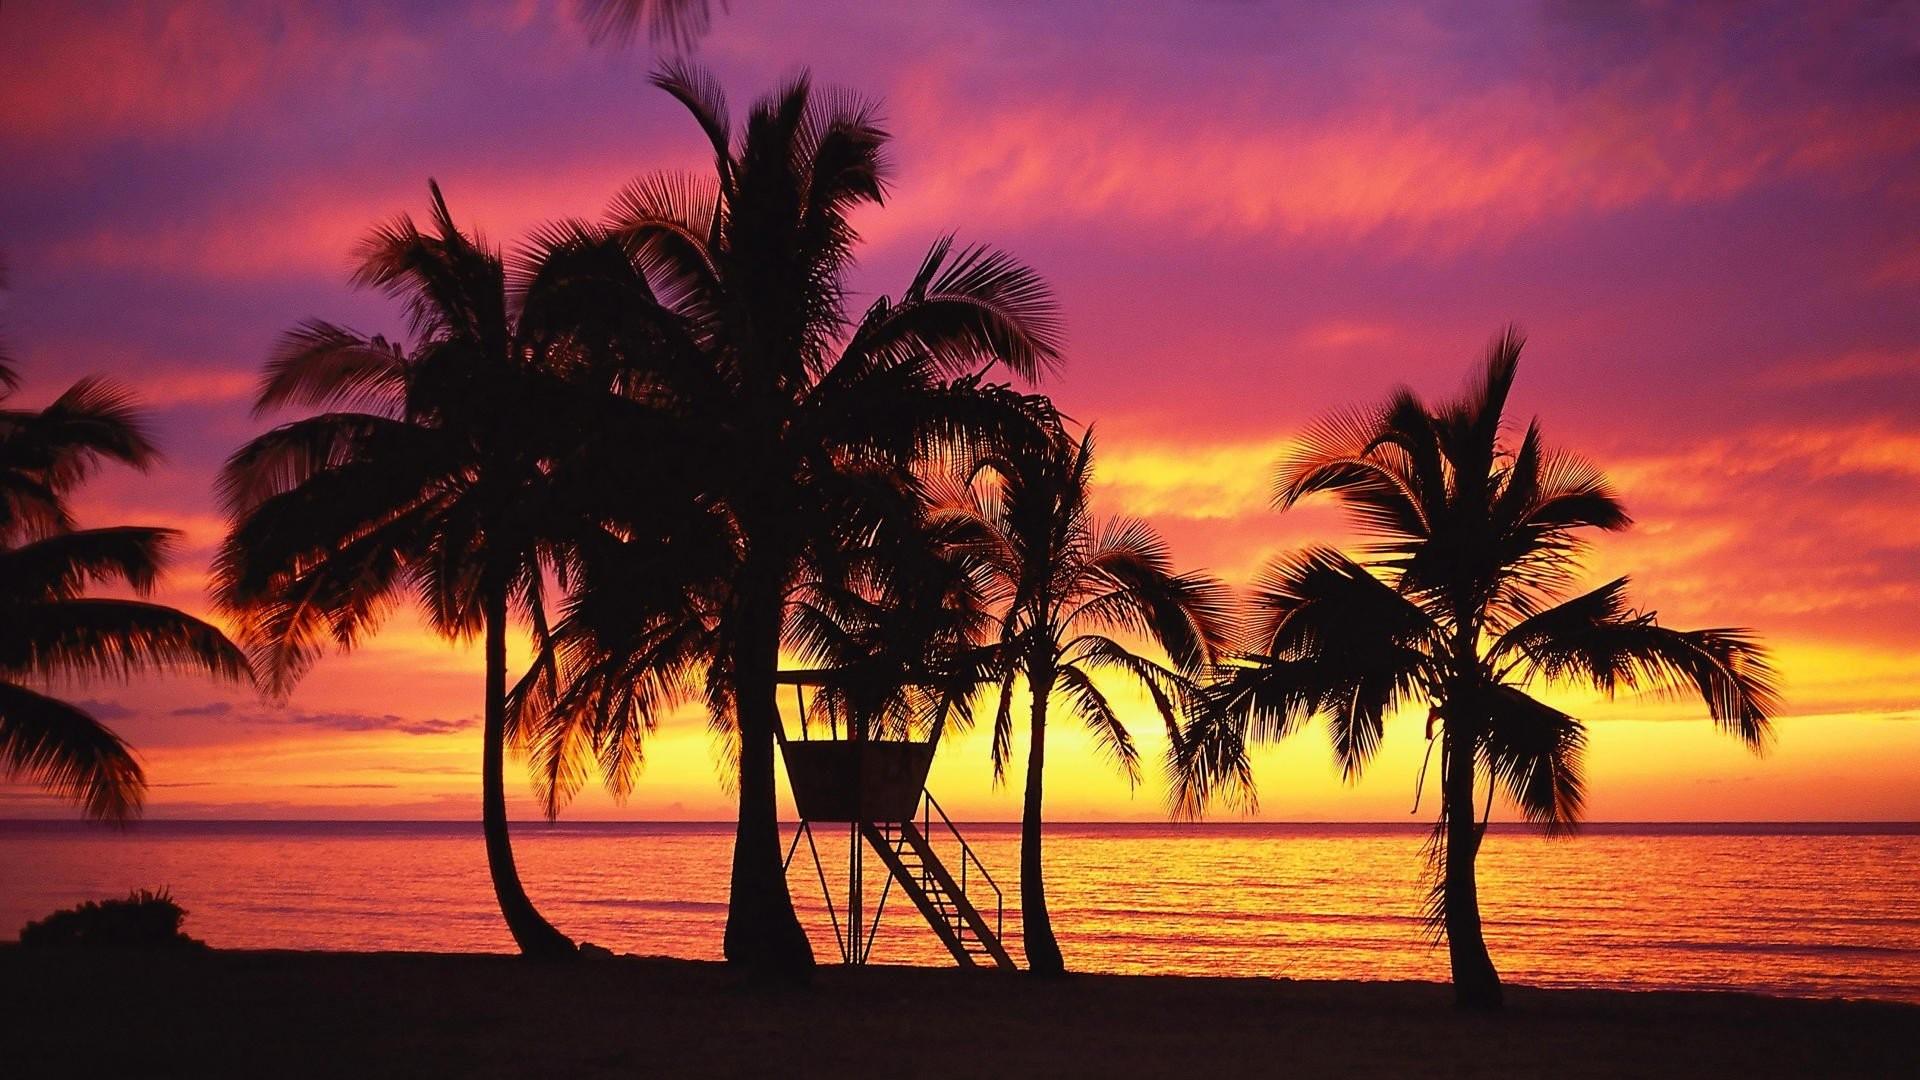 Wallpaper hawaii image sunset fresh images nature.